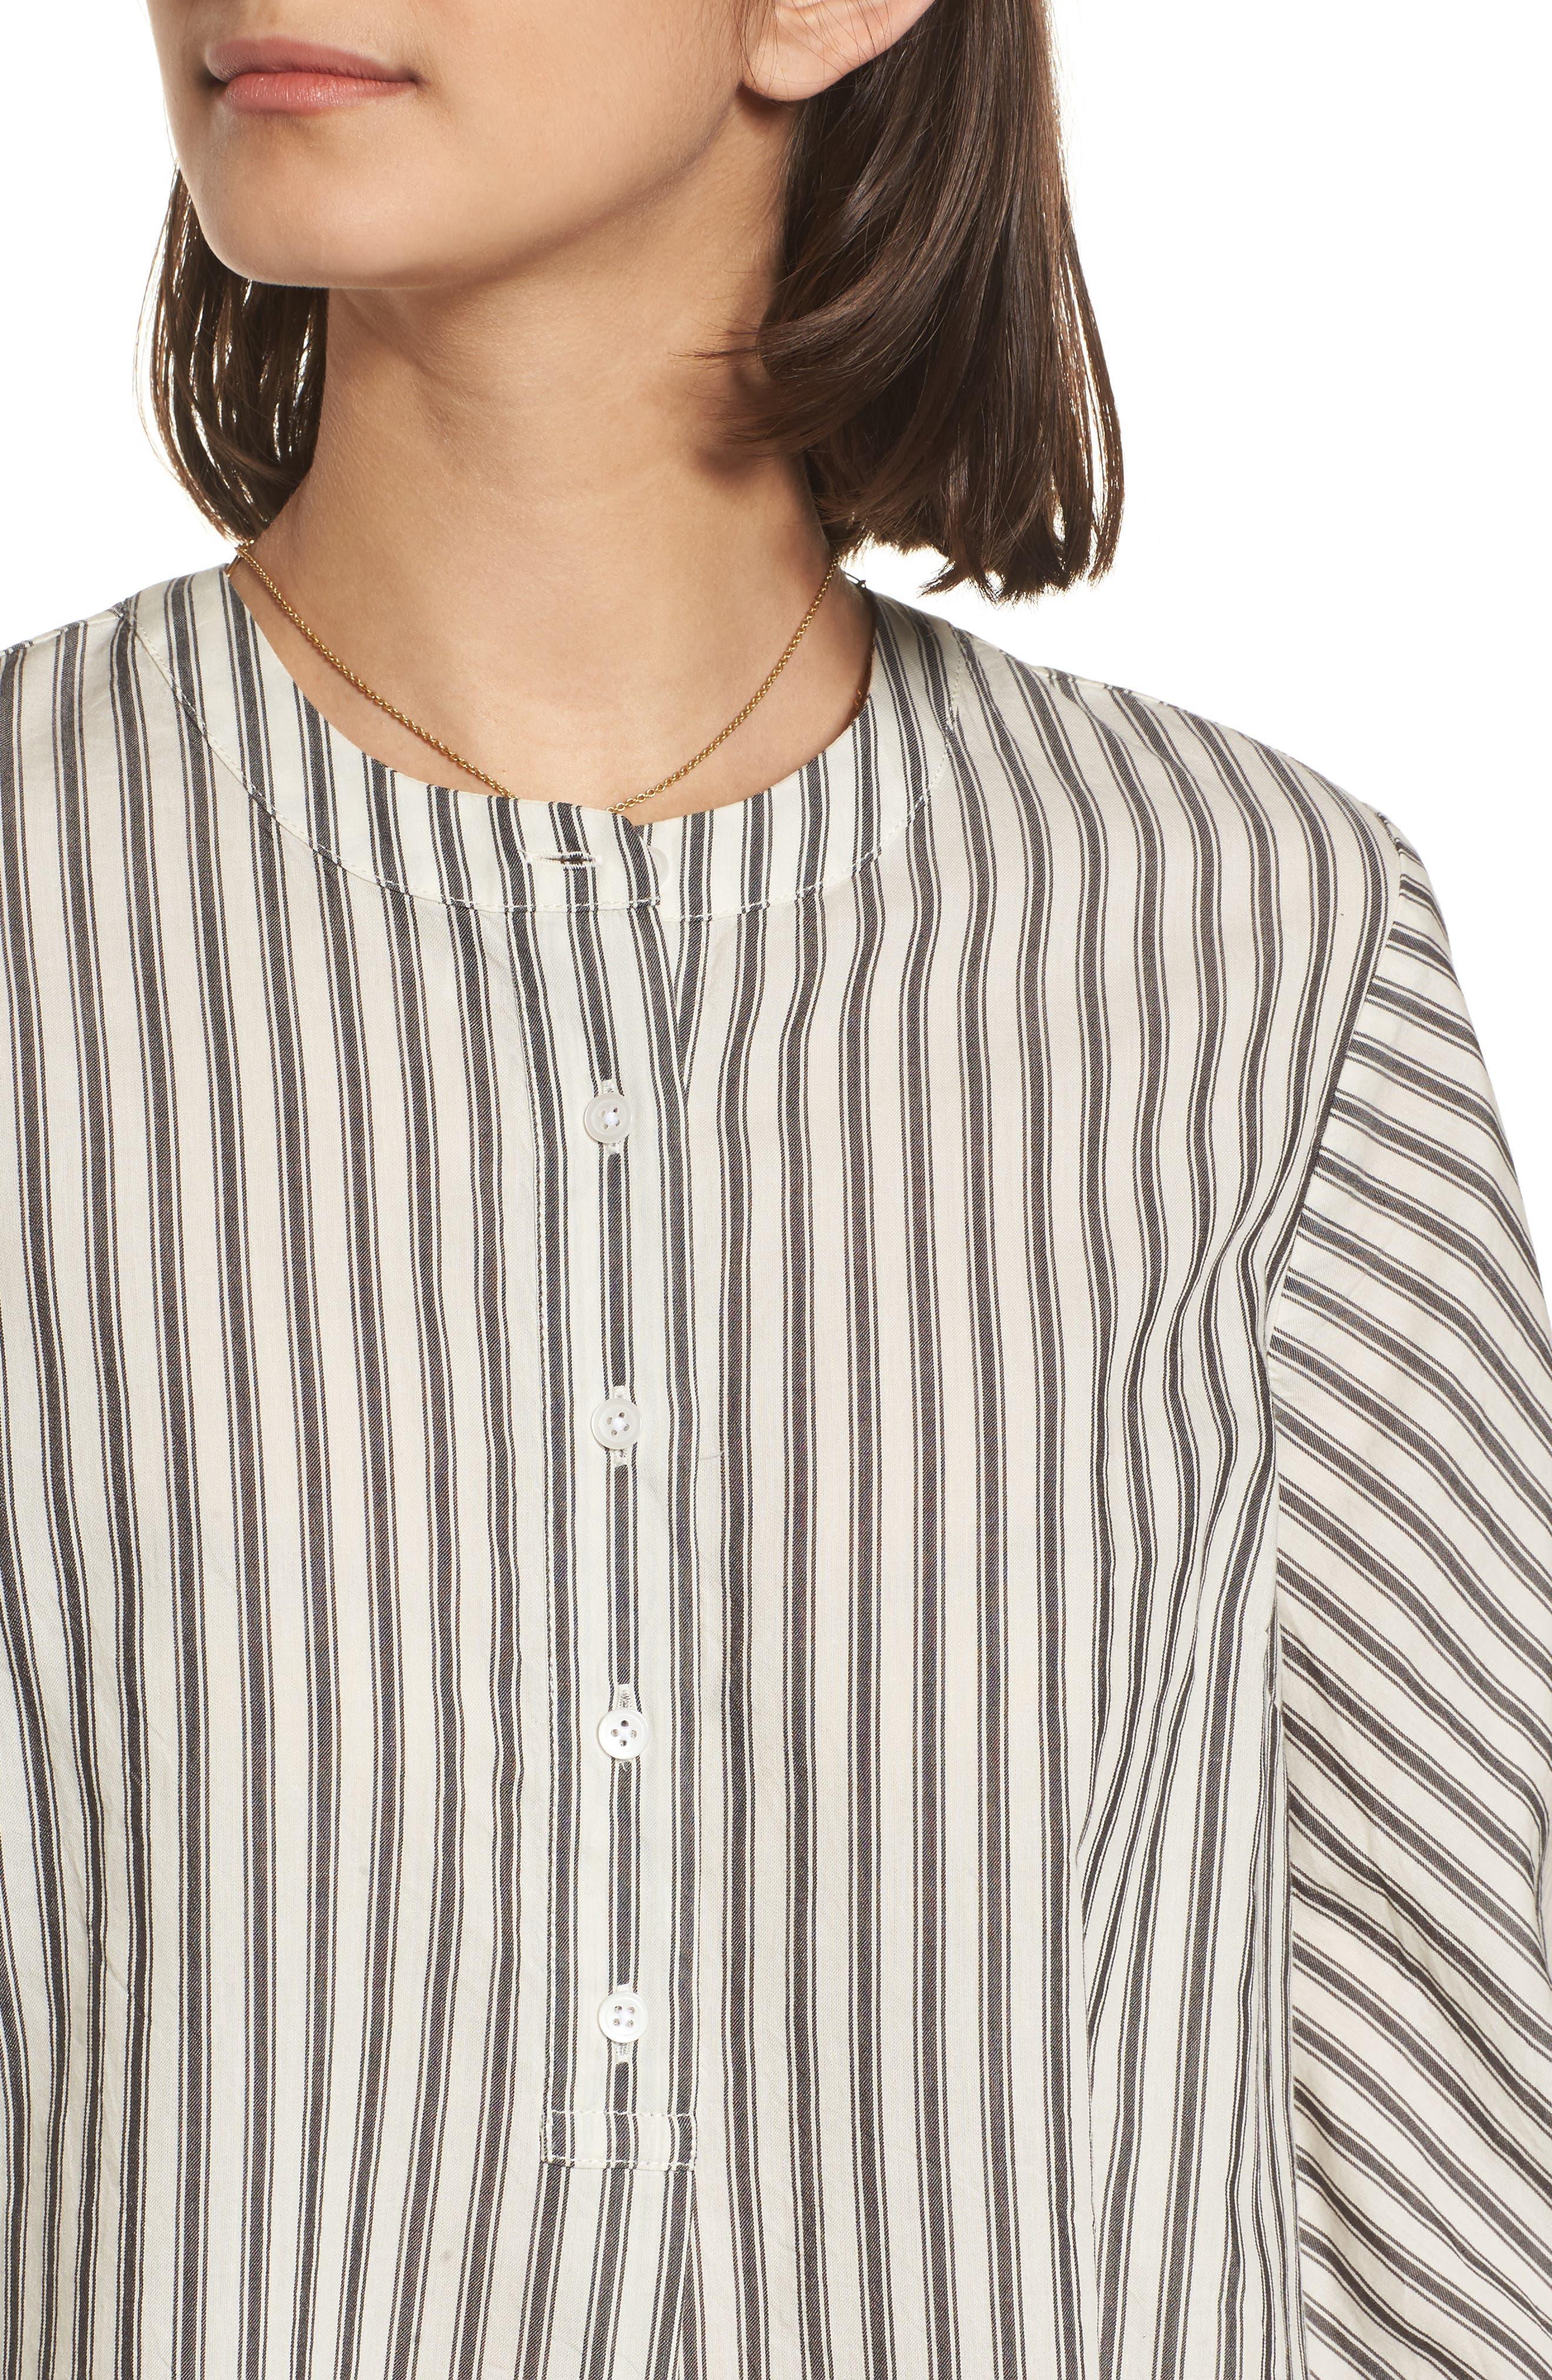 Stripe Flare Sleeve Shirt,                             Alternate thumbnail 4, color,                             190